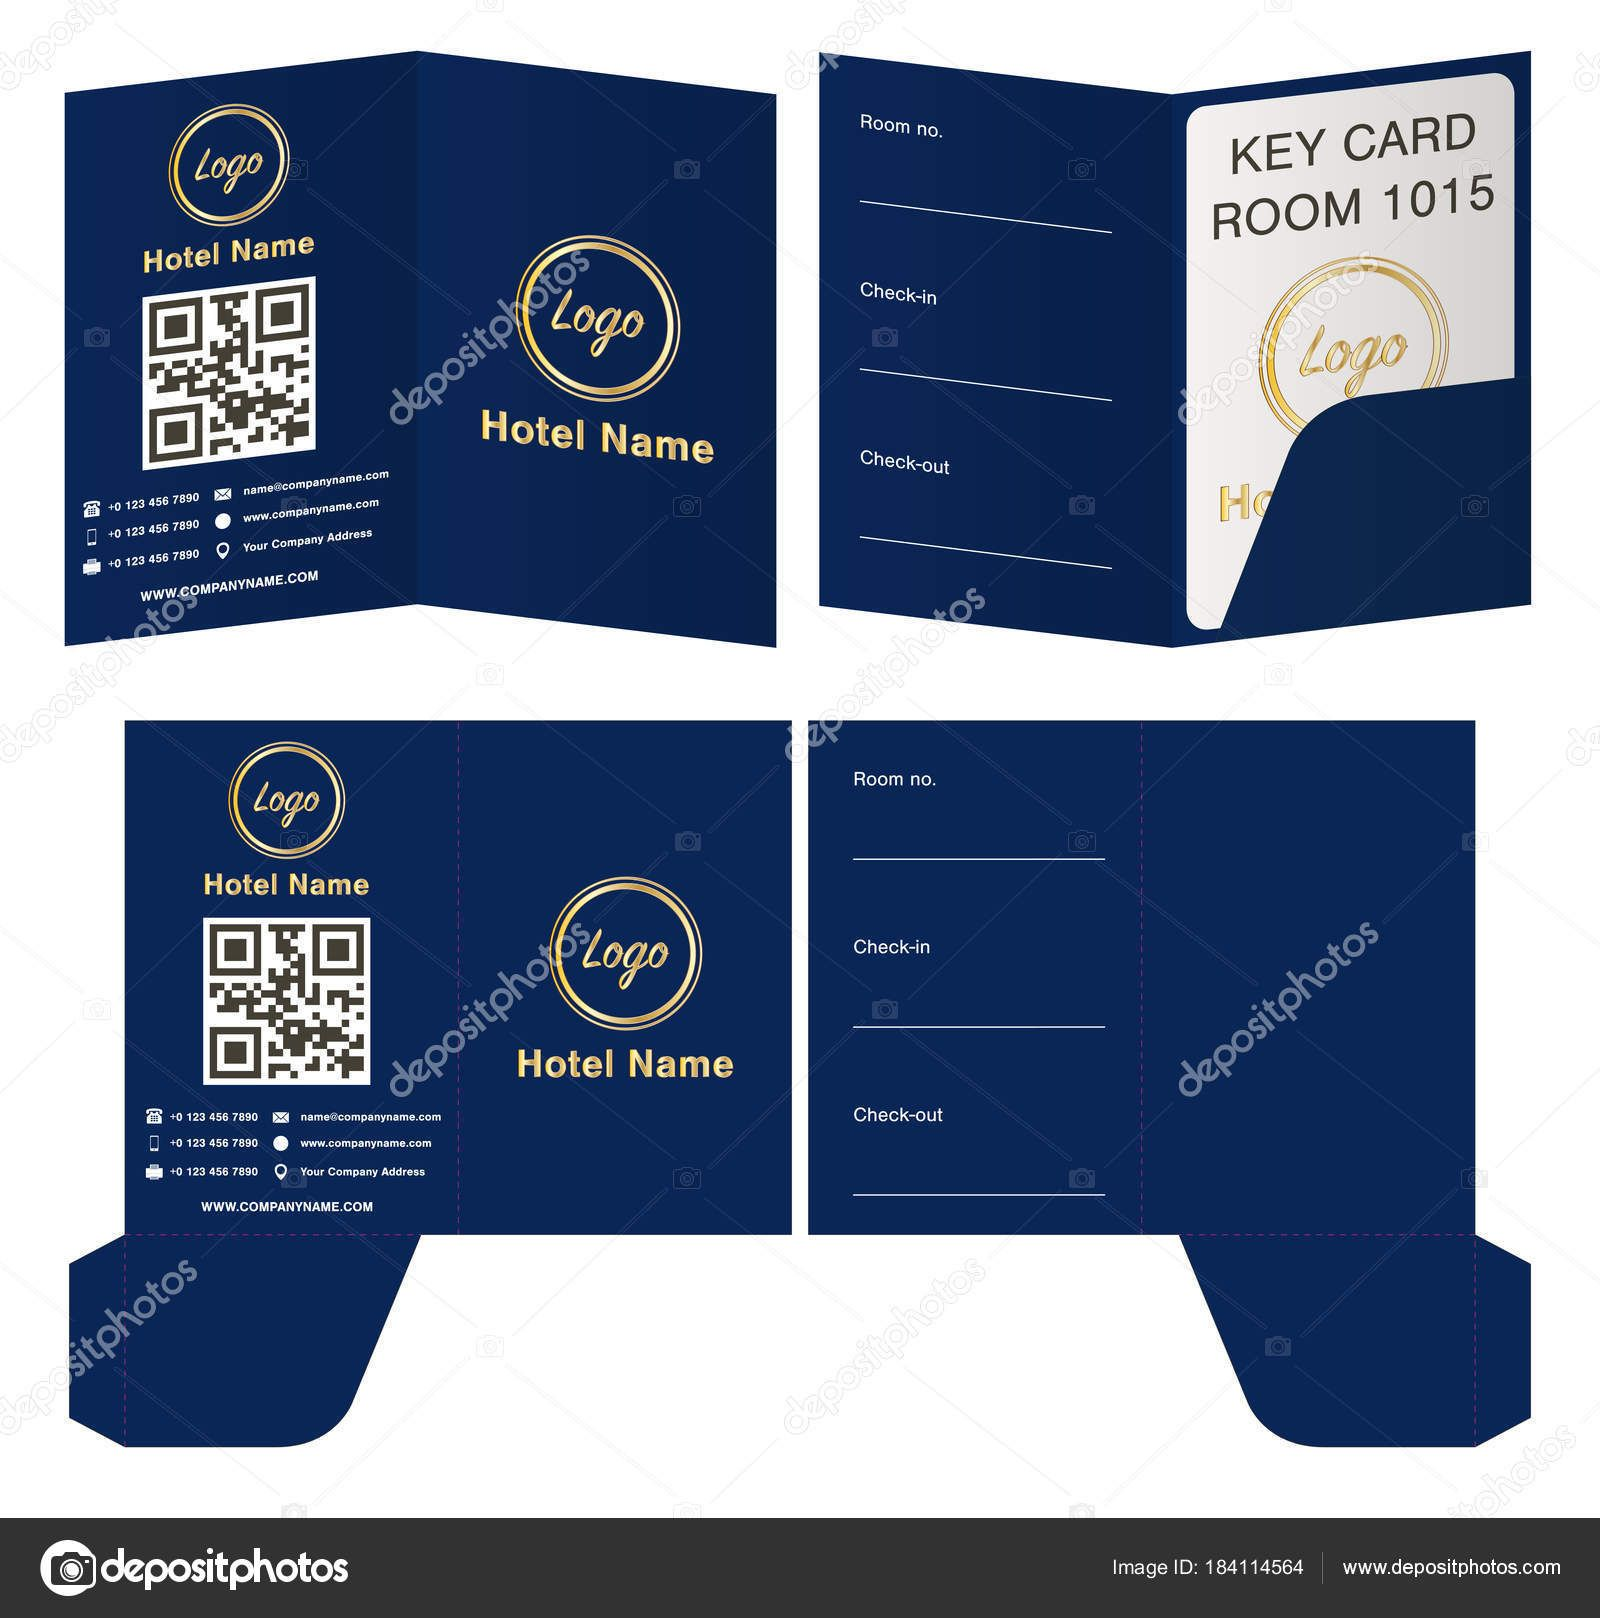 The Remarkable Key Card Holder Template Hotel Key Card Holder Folder With Hotel Key Card Template Pics Hotel Key Cards Create Business Cards Key Card Holder